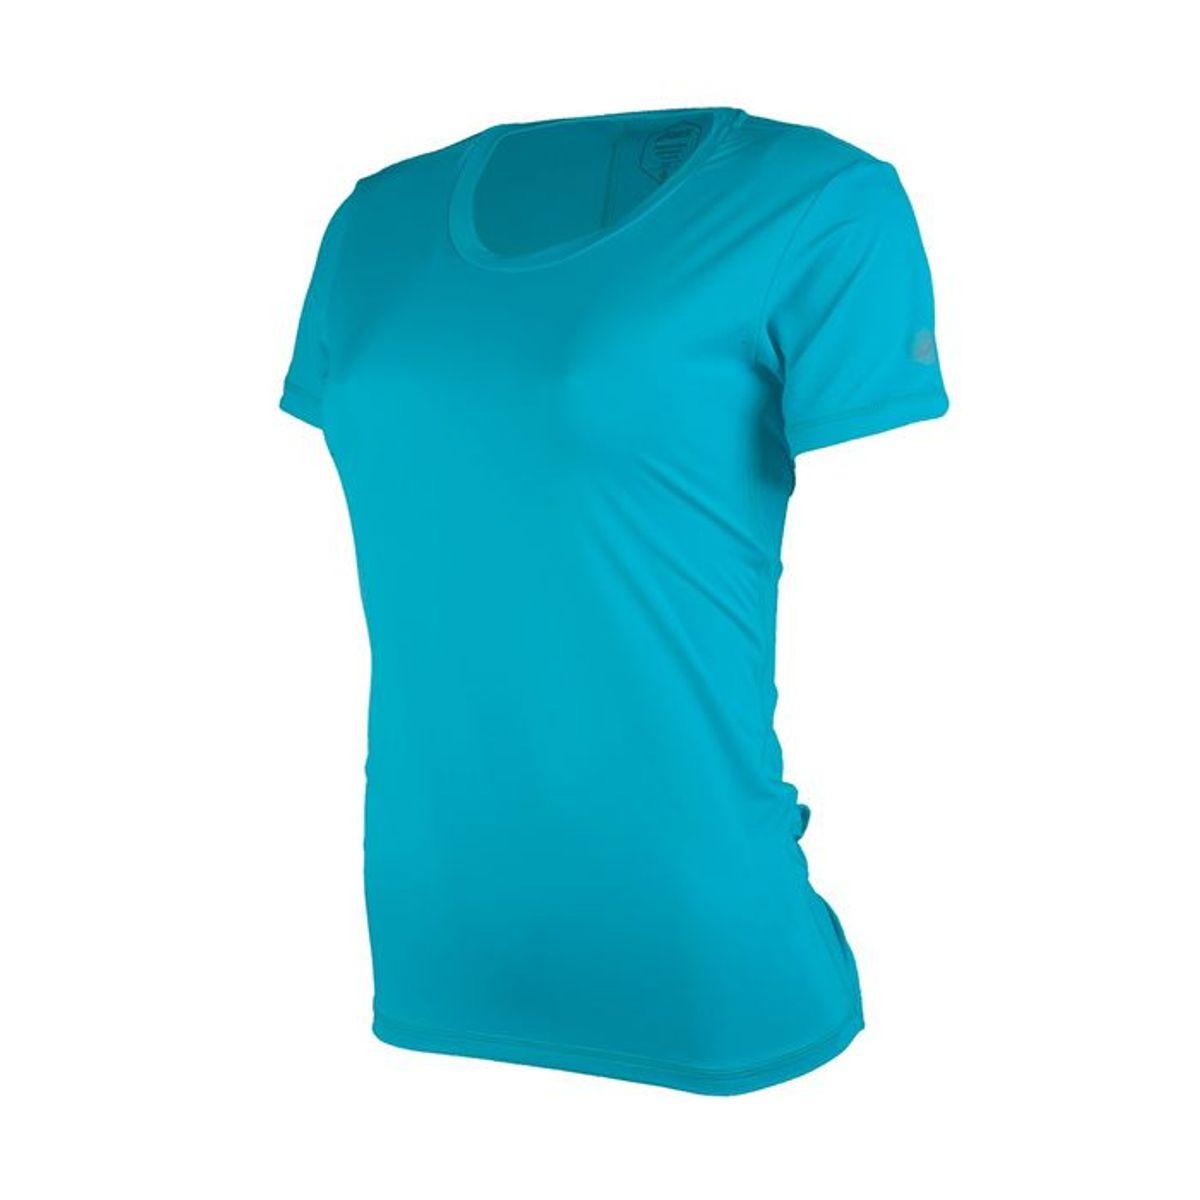 Camiseta-Asics-Functional---Feminino---Azul